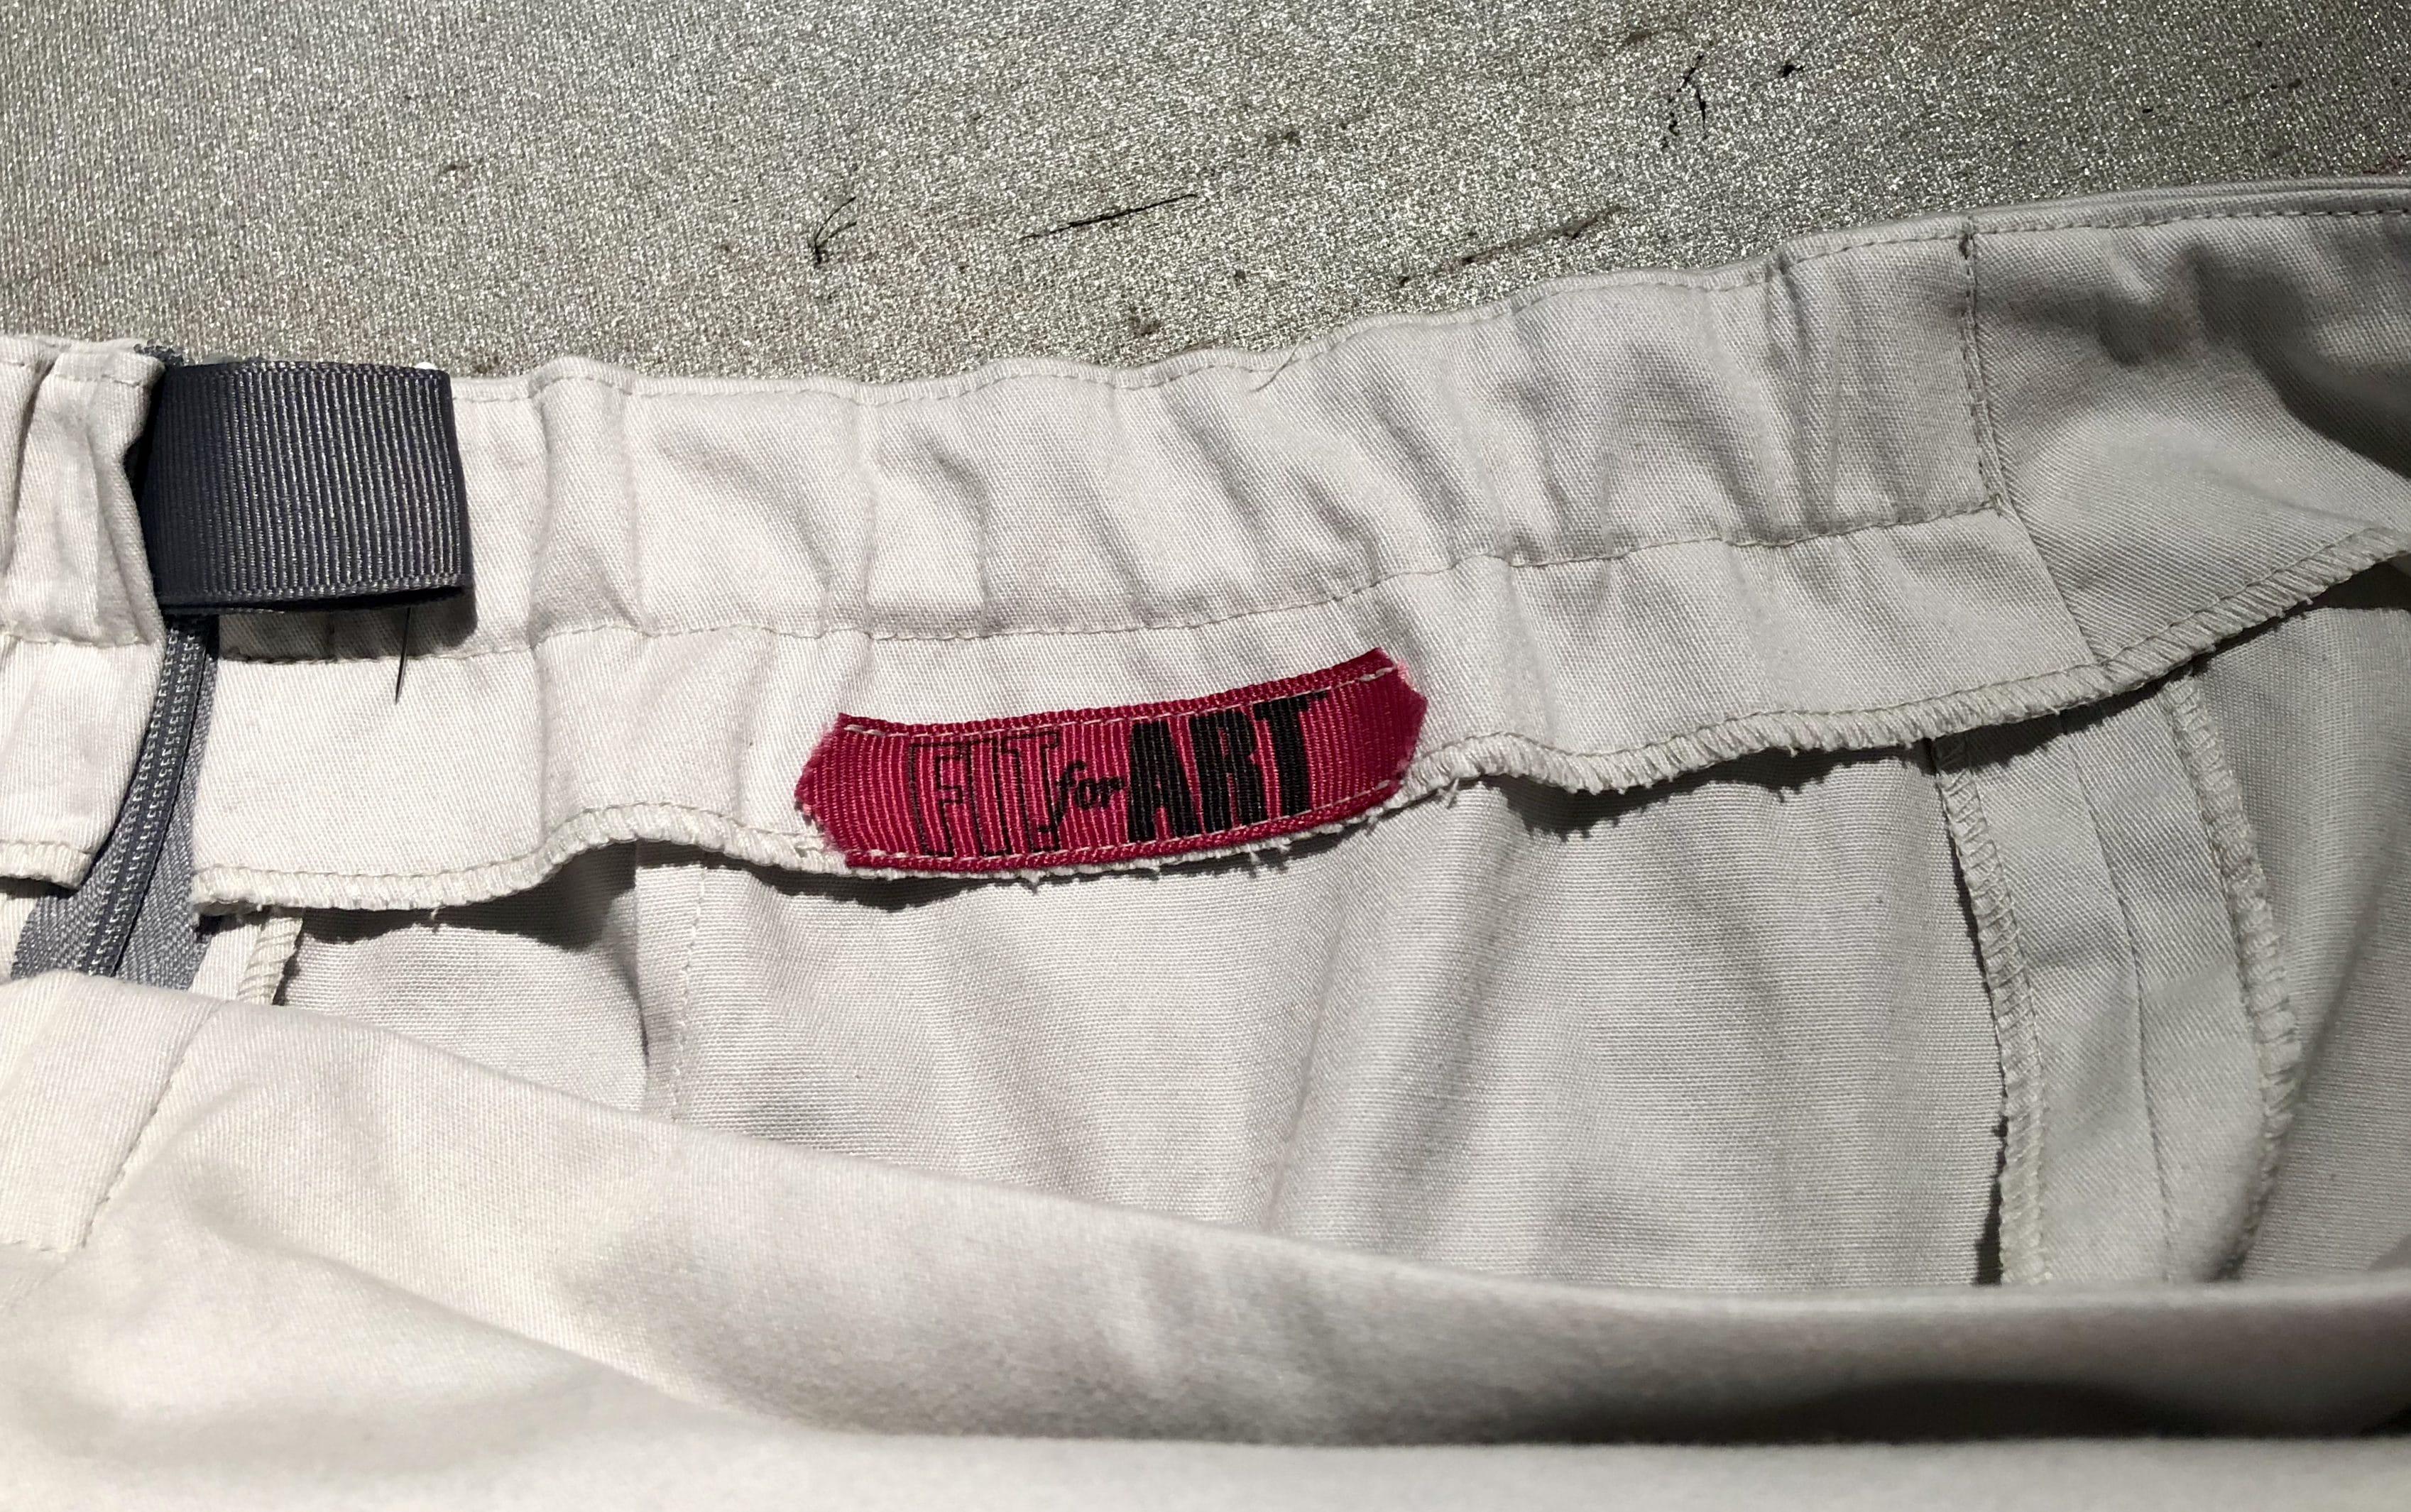 Faced Waist Eureka! Pants with Elastic Insert